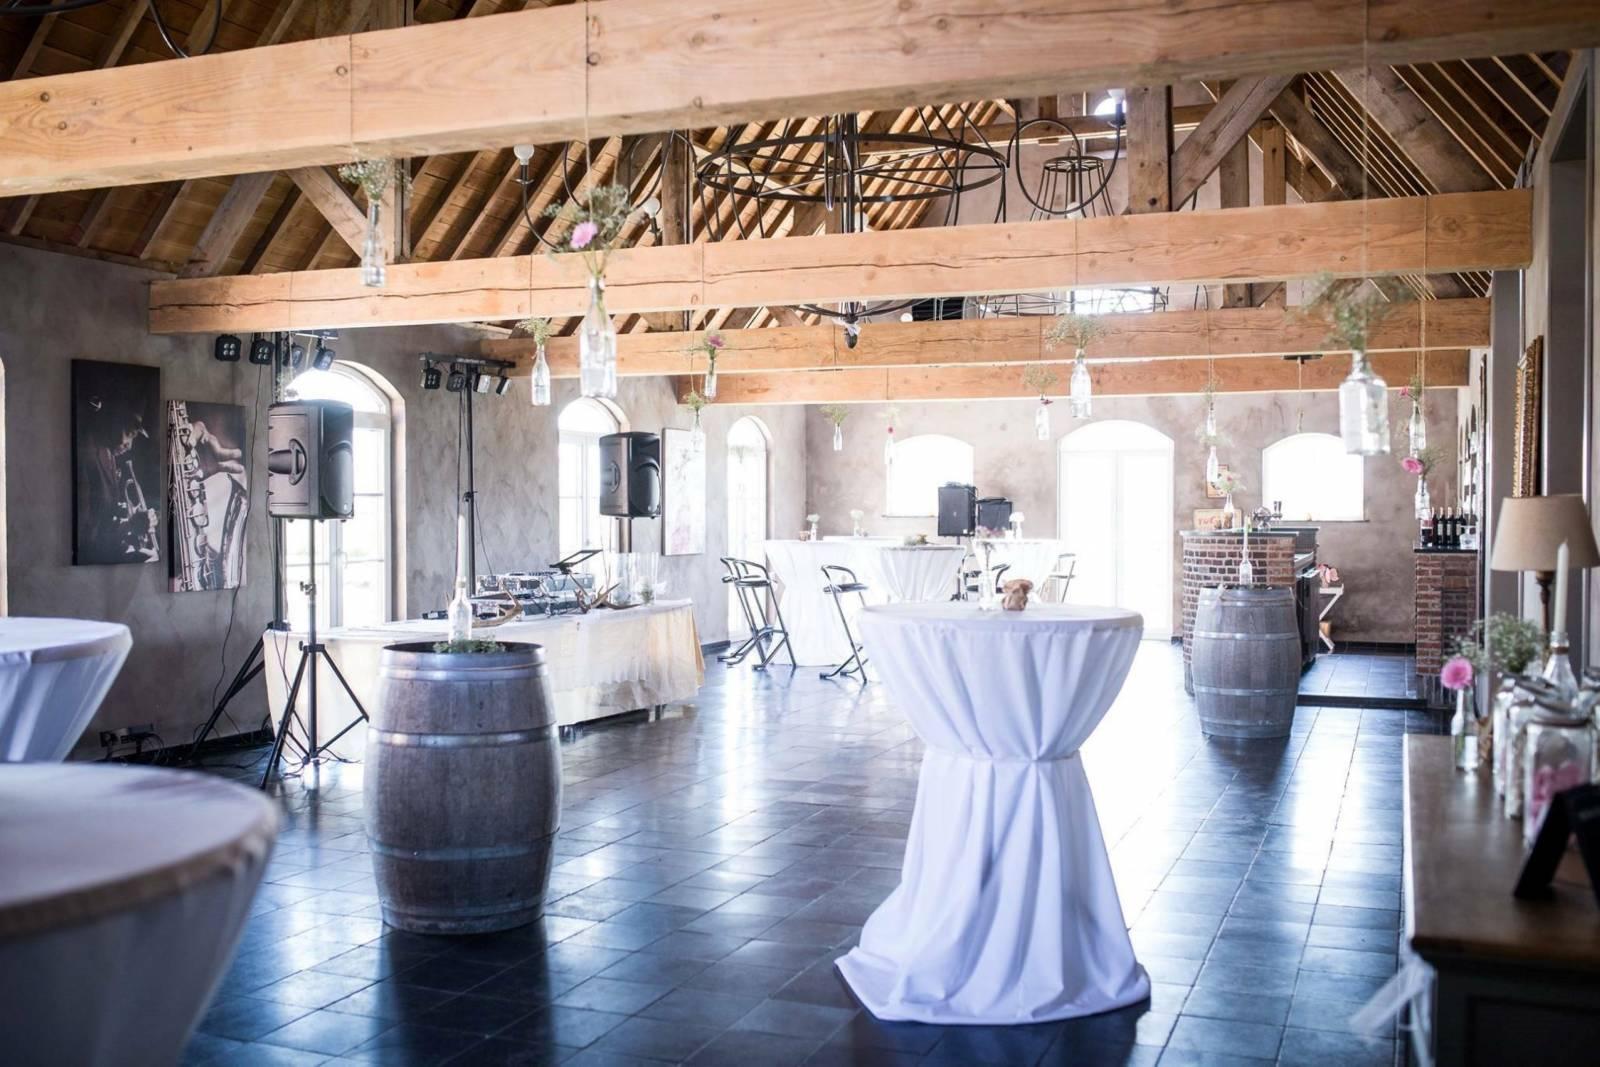 House of Weddings Domein t Eikennest Feestzaal West-Vlaanderen Diksmuide Beerst Tuin Park Vijver Tent Ceremonie Schuur pold (9)